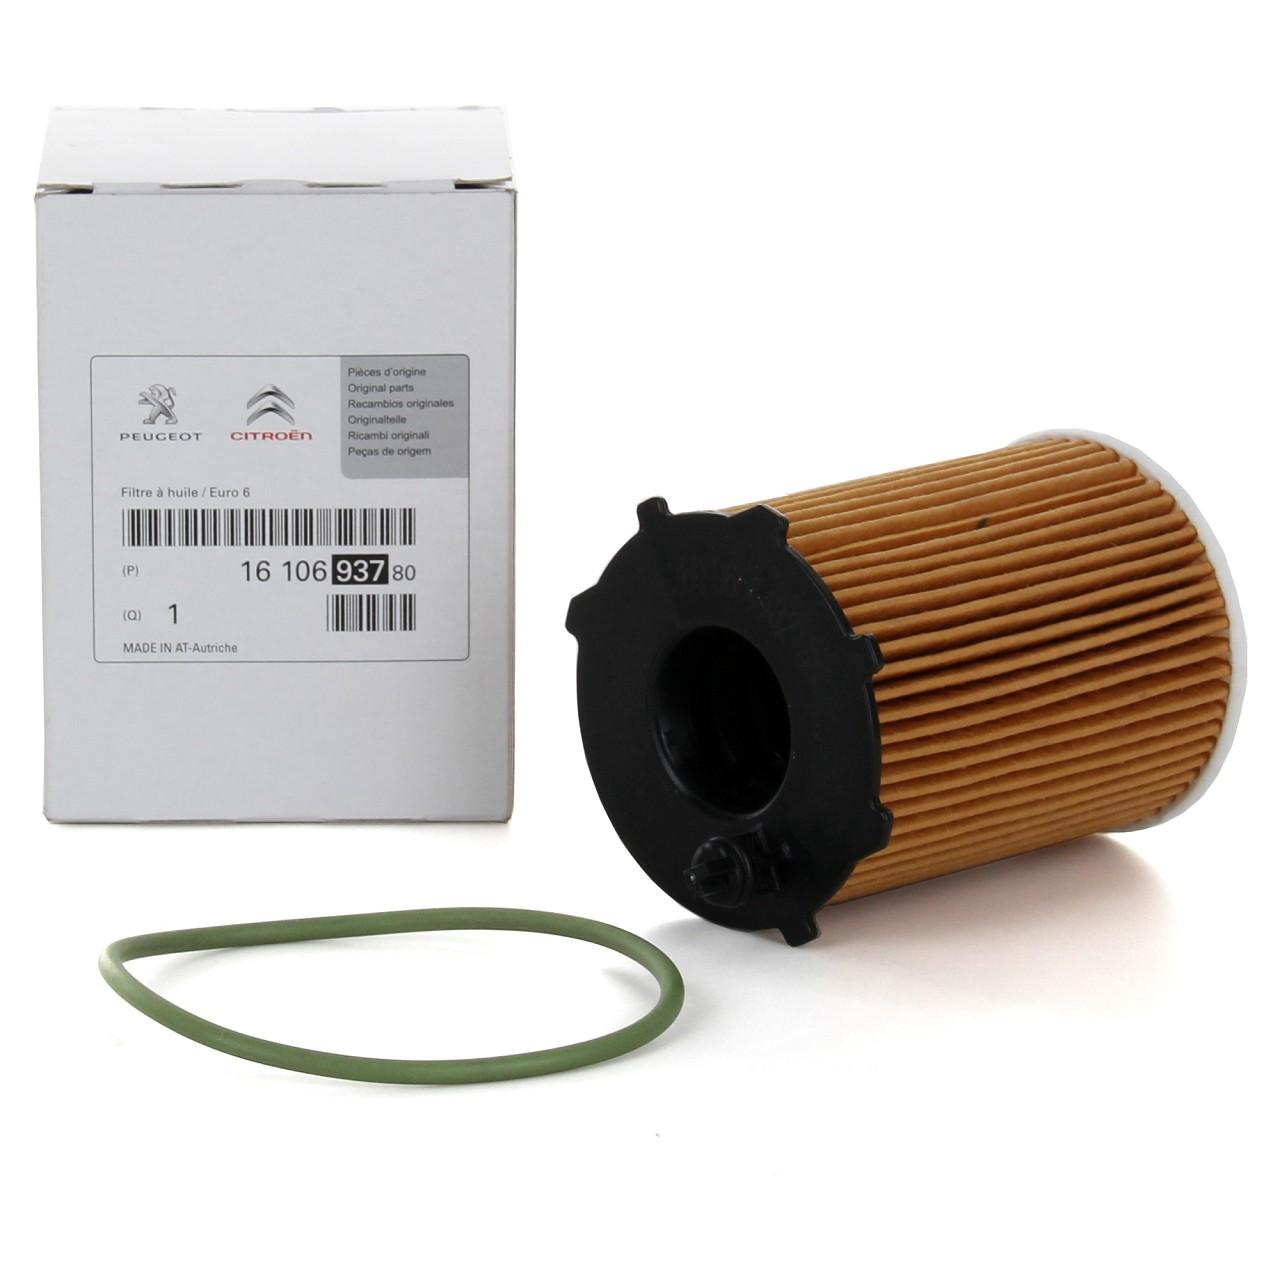 ORIGINAL Citroen Peugeot Ölfilter Motorölfilter 1.6HDi 68-120 PS1610693780